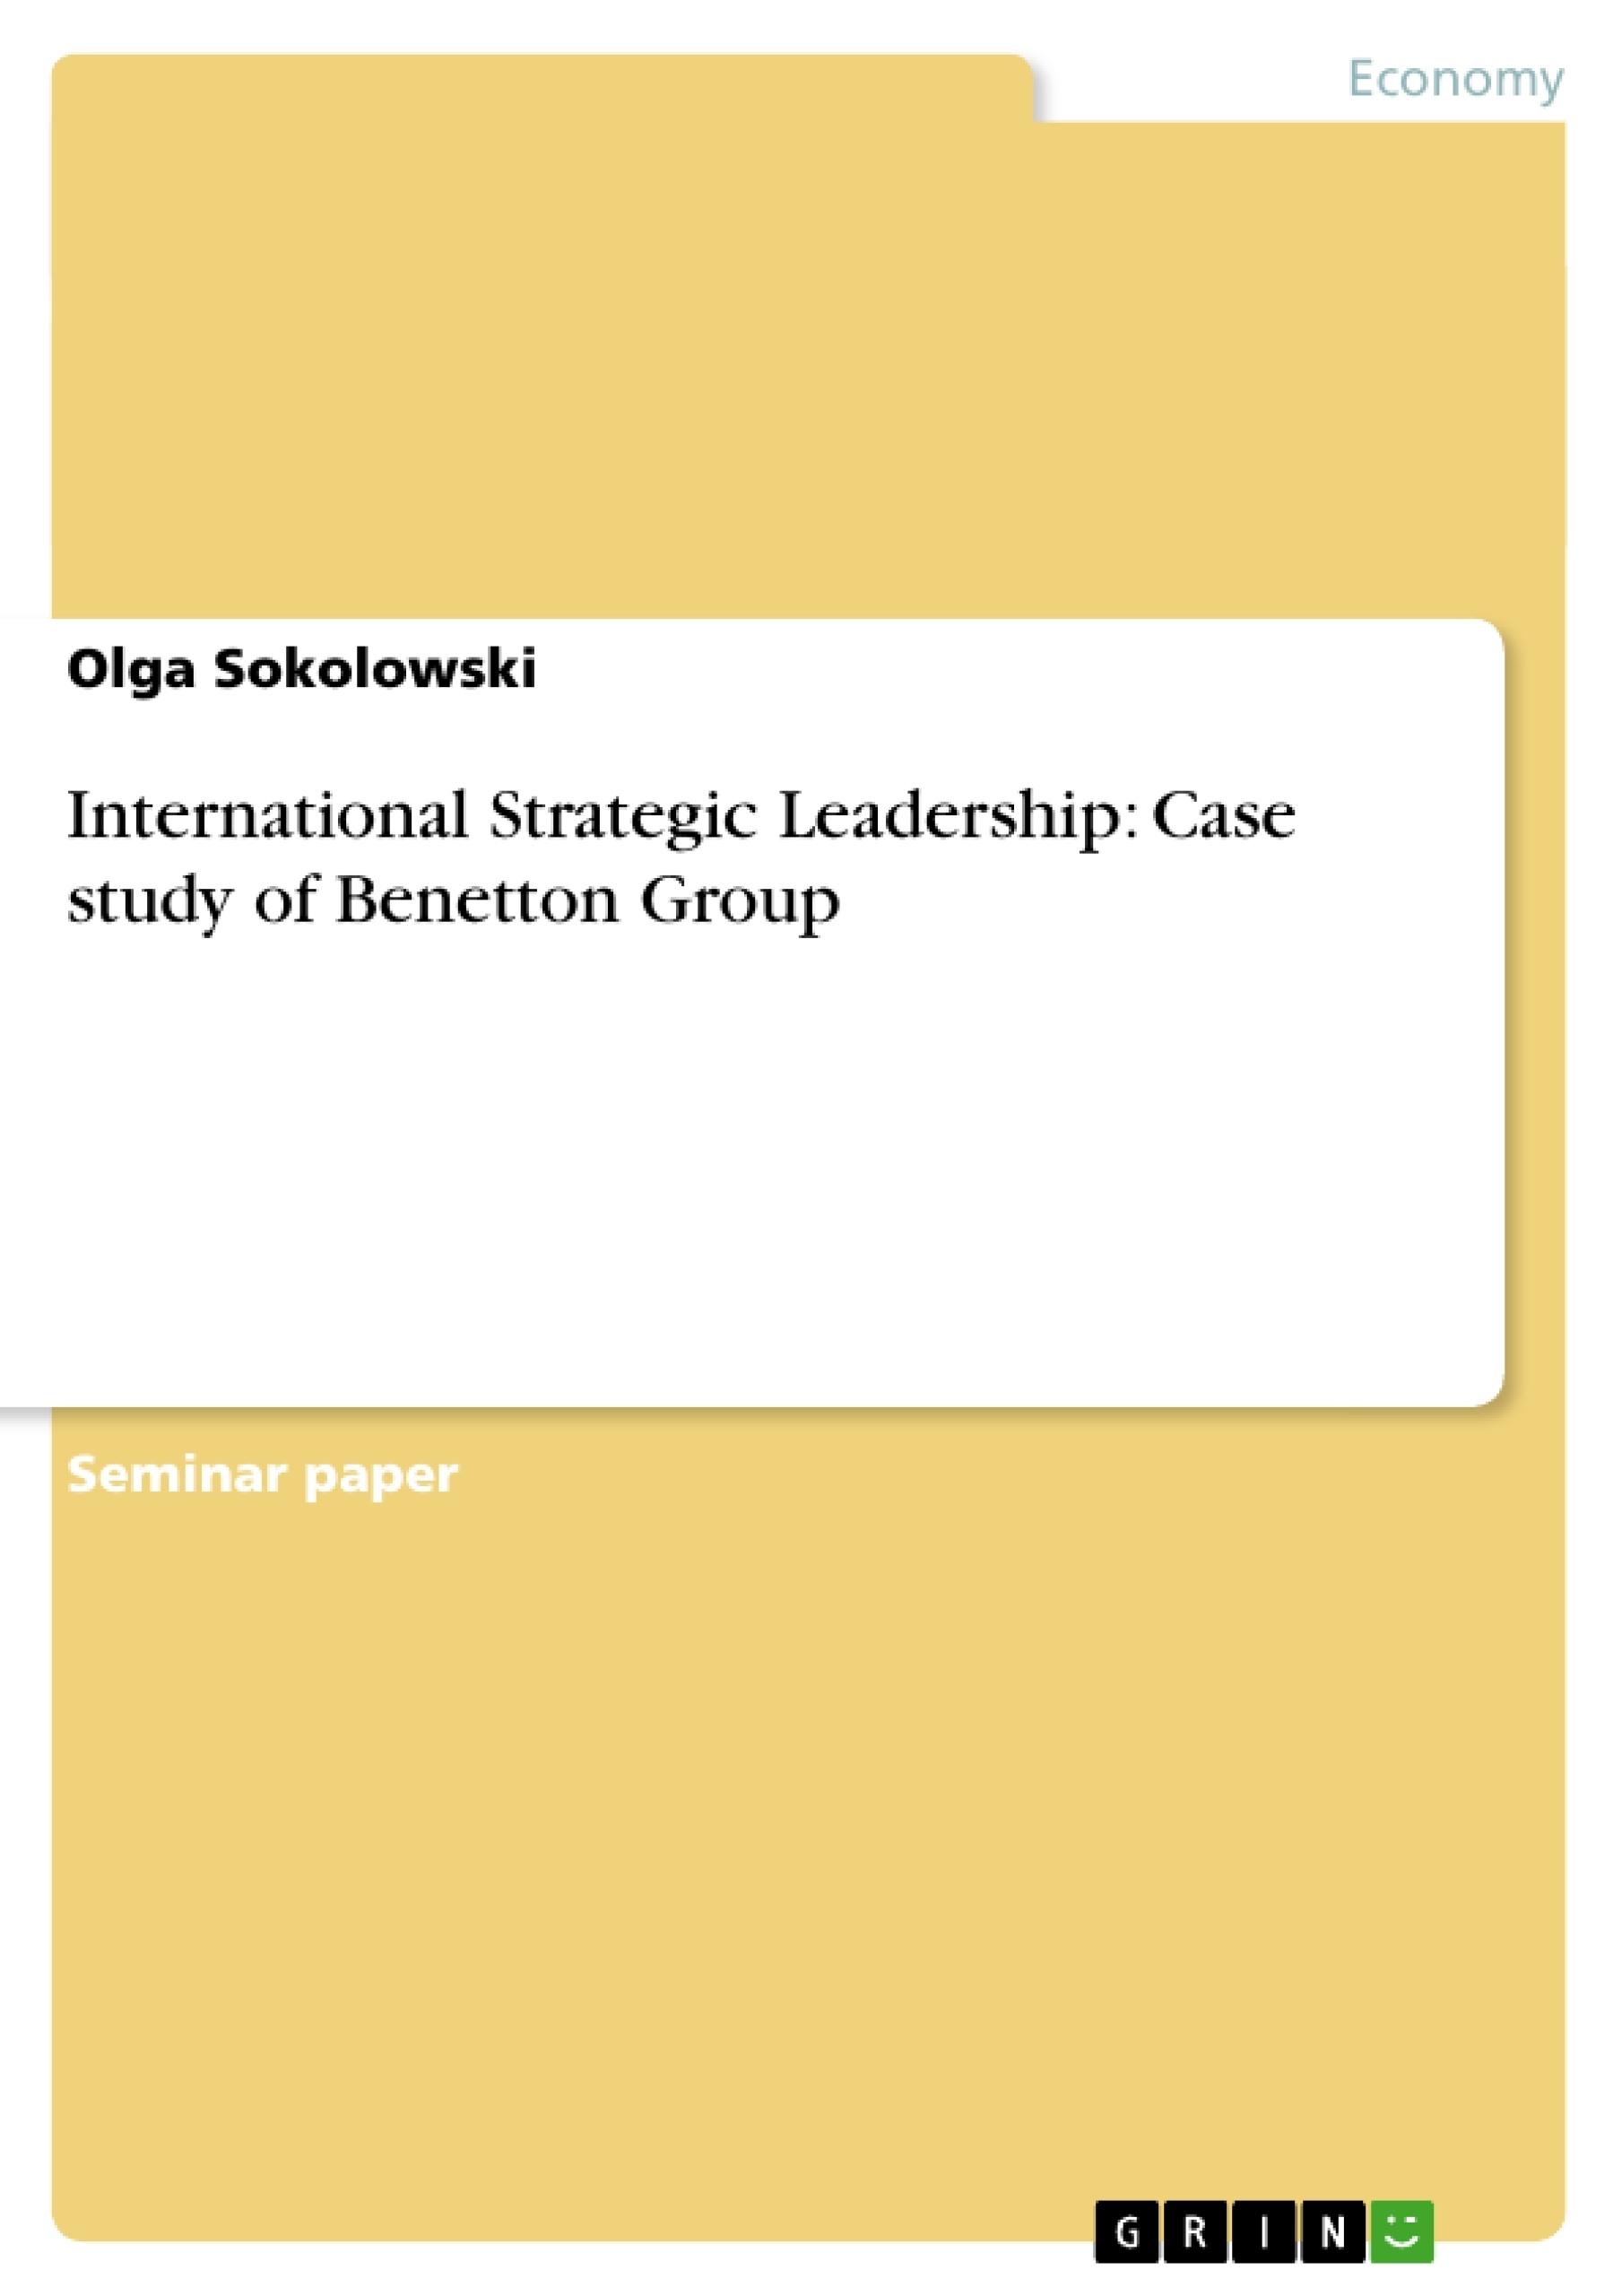 Title: International Strategic Leadership: Case study of Benetton Group